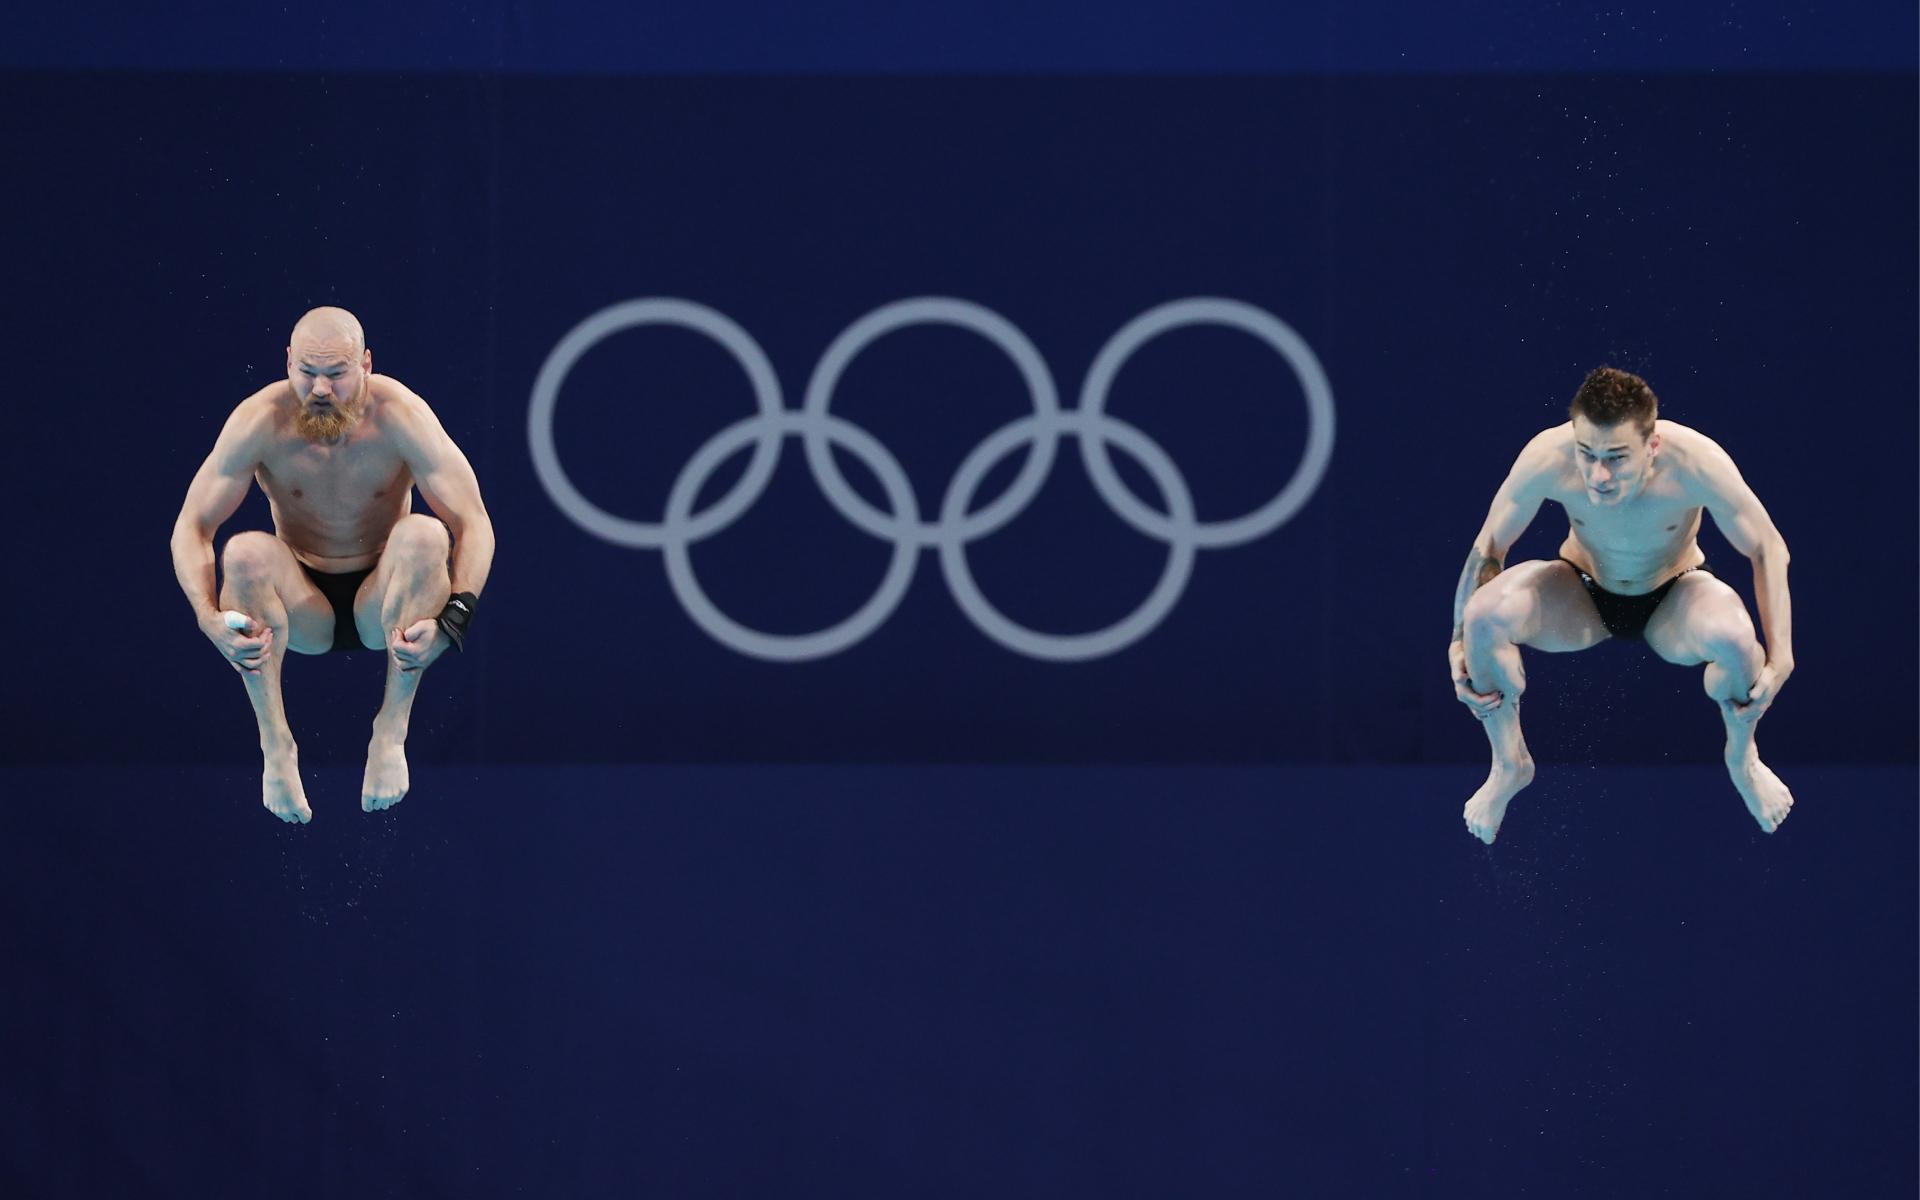 Фото: Евгений Кузнецов и Никита Шлейхер (Maddie Meyer/Getty Images)